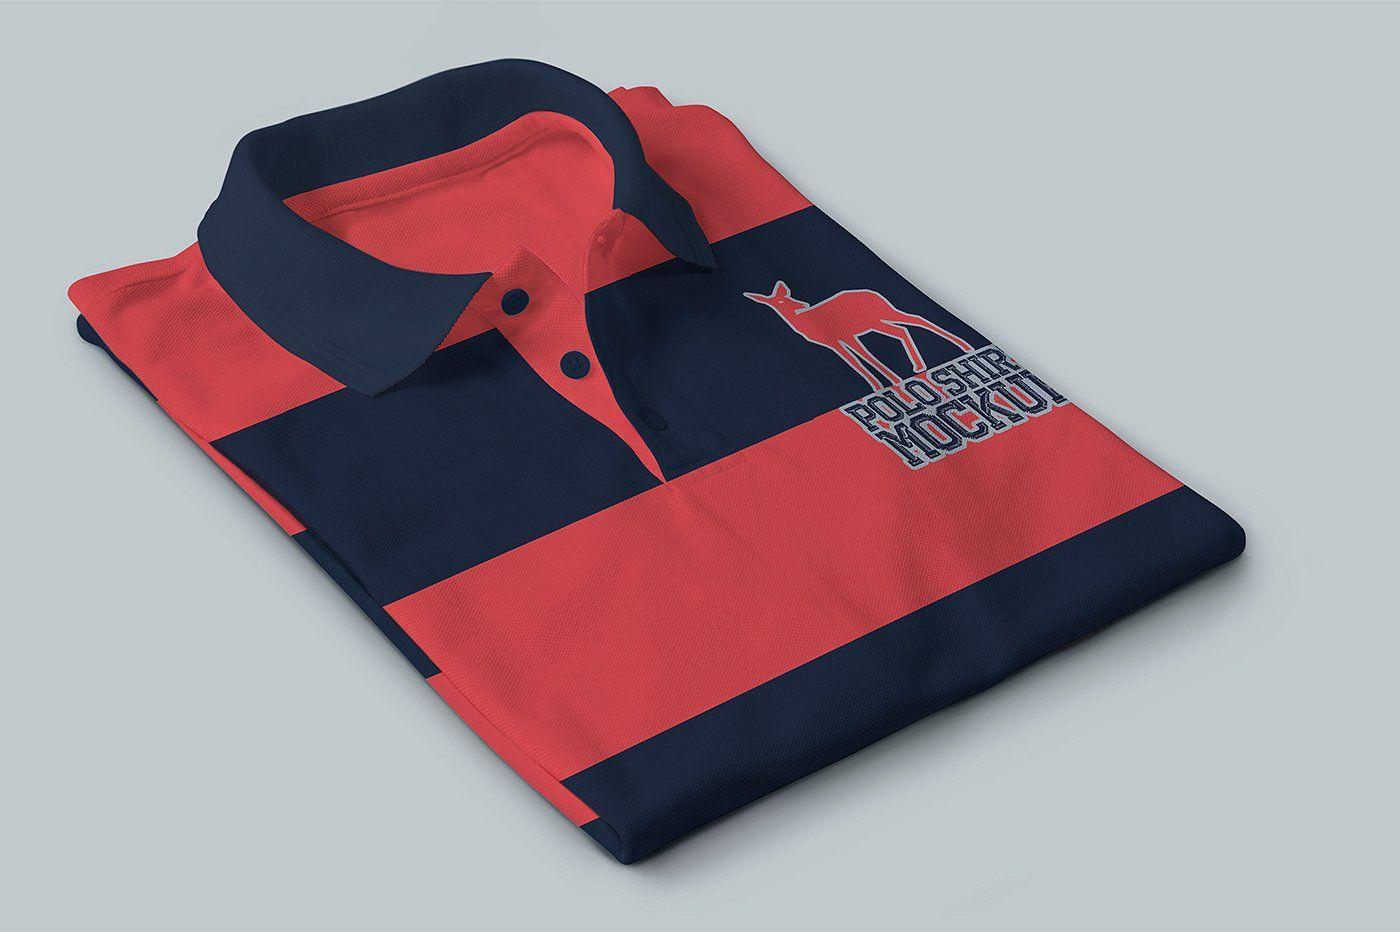 Download Polo T Shirt Psd Mockups Vol 3 Polo Shirt Design Polo T Shirts Shirt Mockup